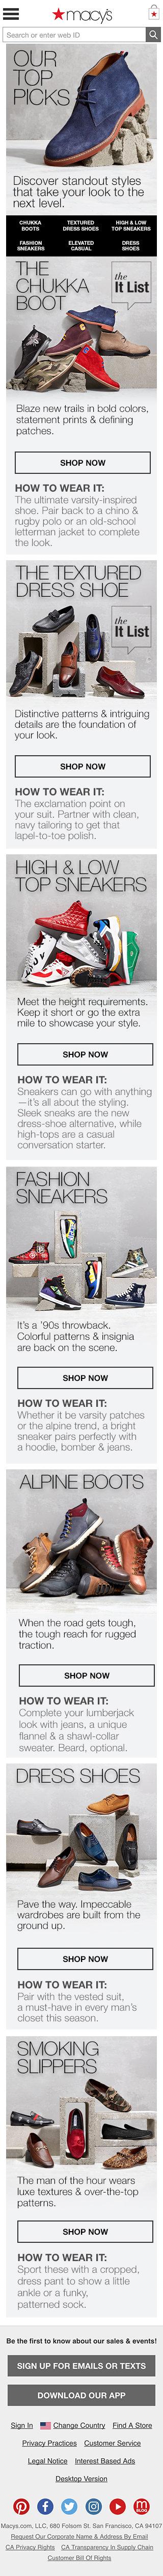 Mens_Shoe_Trend_18_dt2.jpg